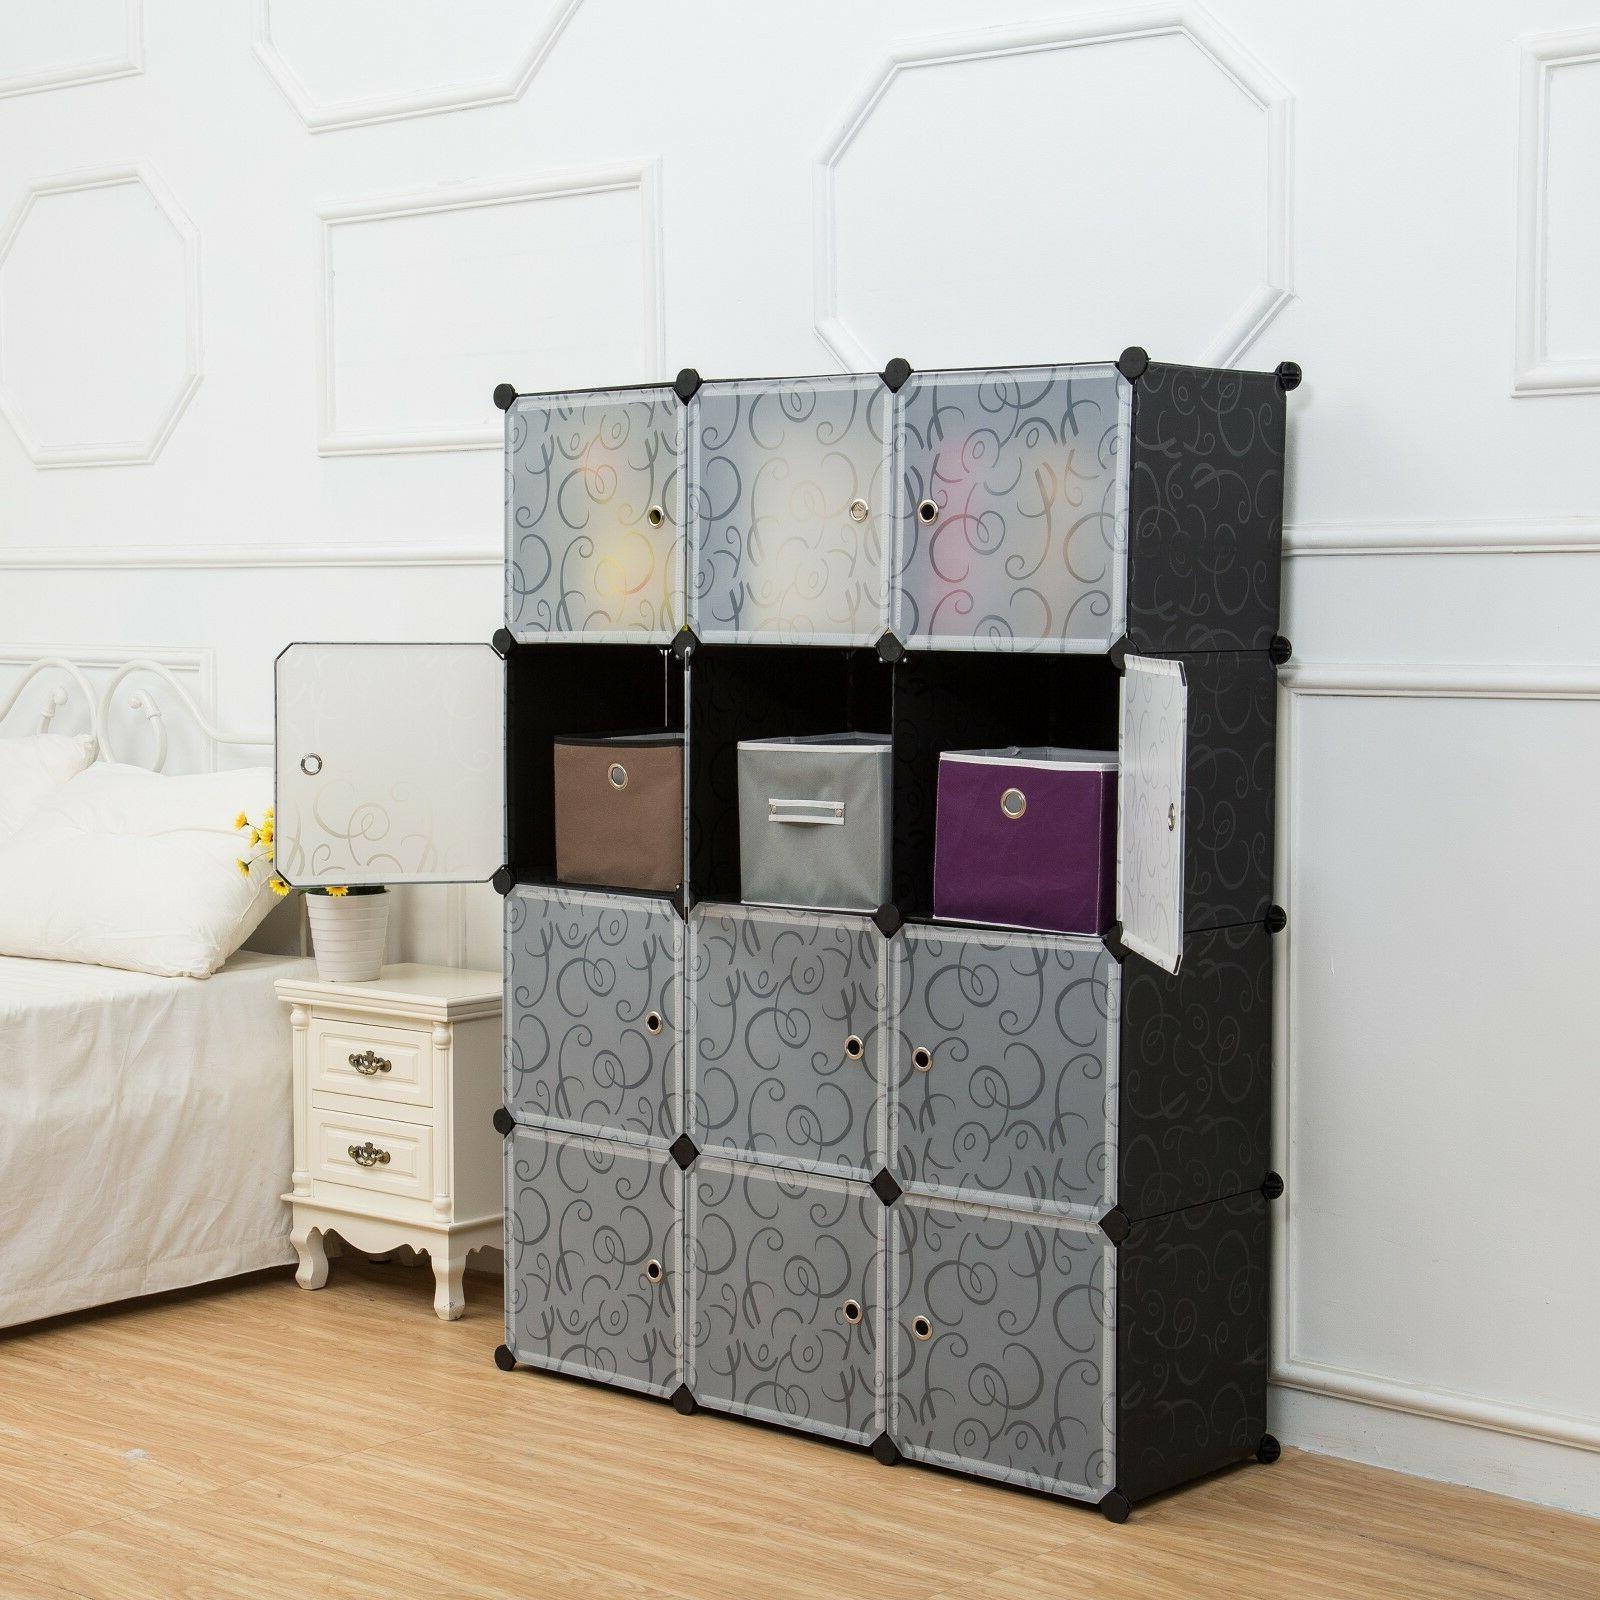 Unicoo-12 Bookcase, Cabinet, Wardrobe